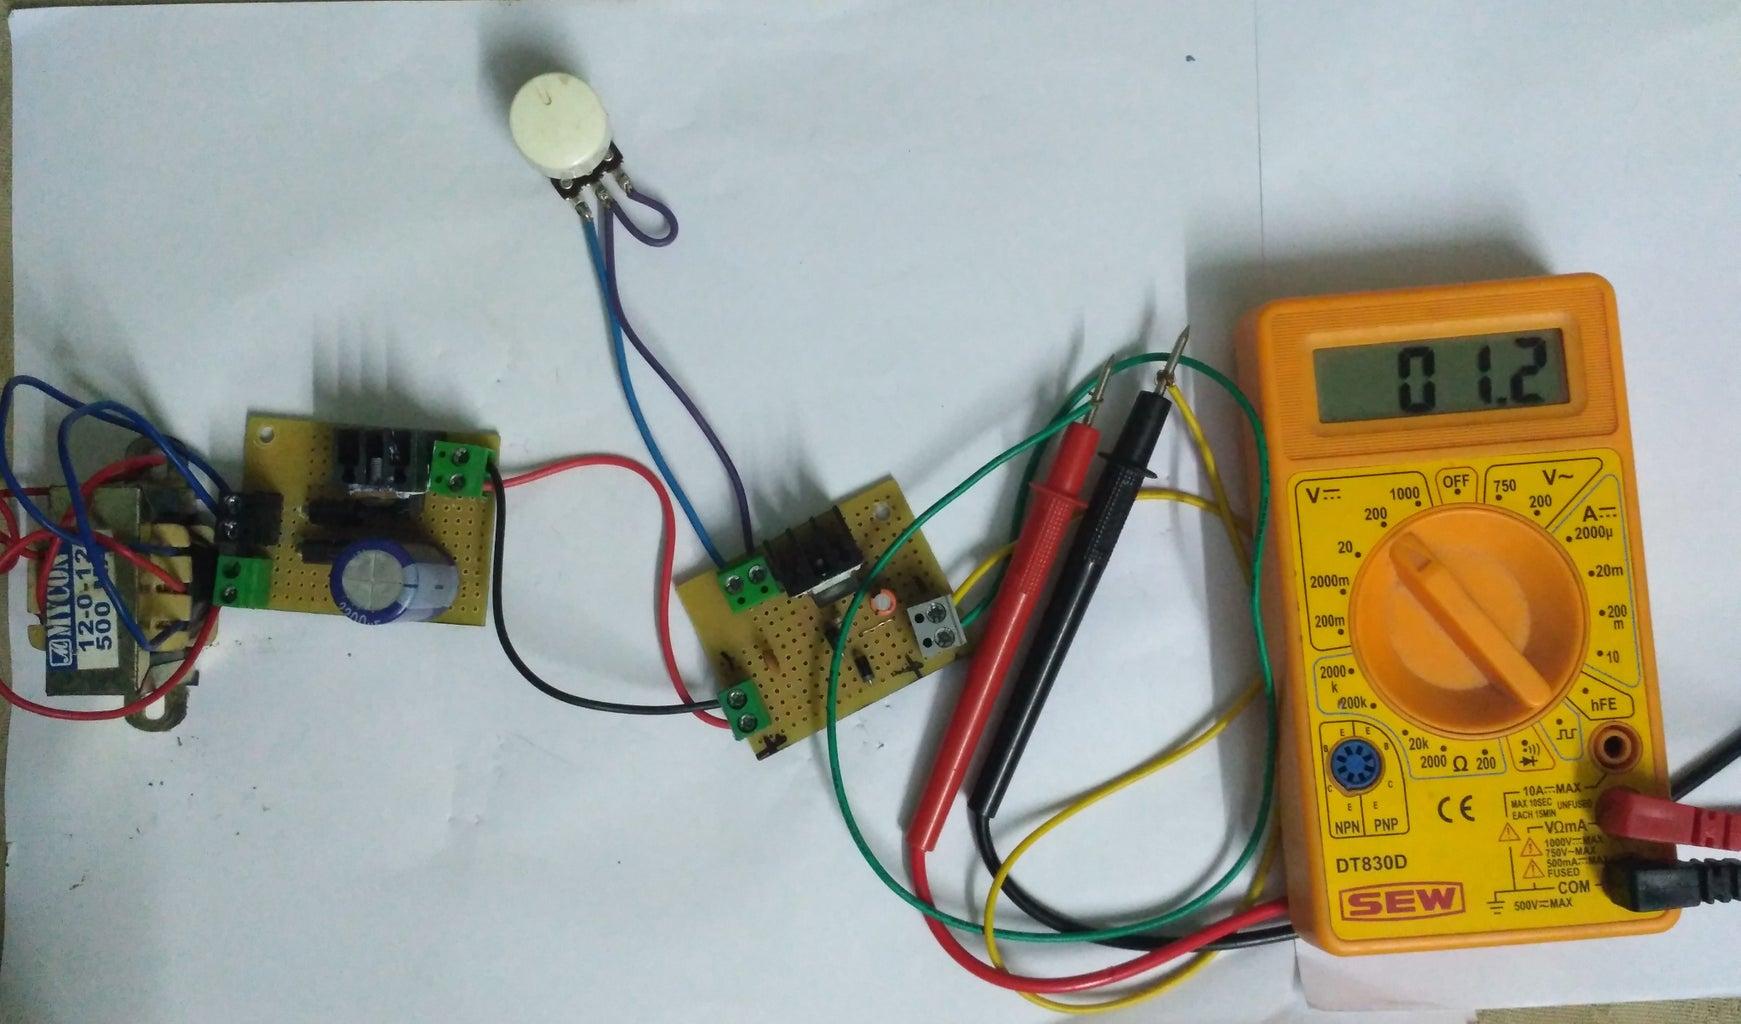 1.2V to 13.4V Variable Power Supply